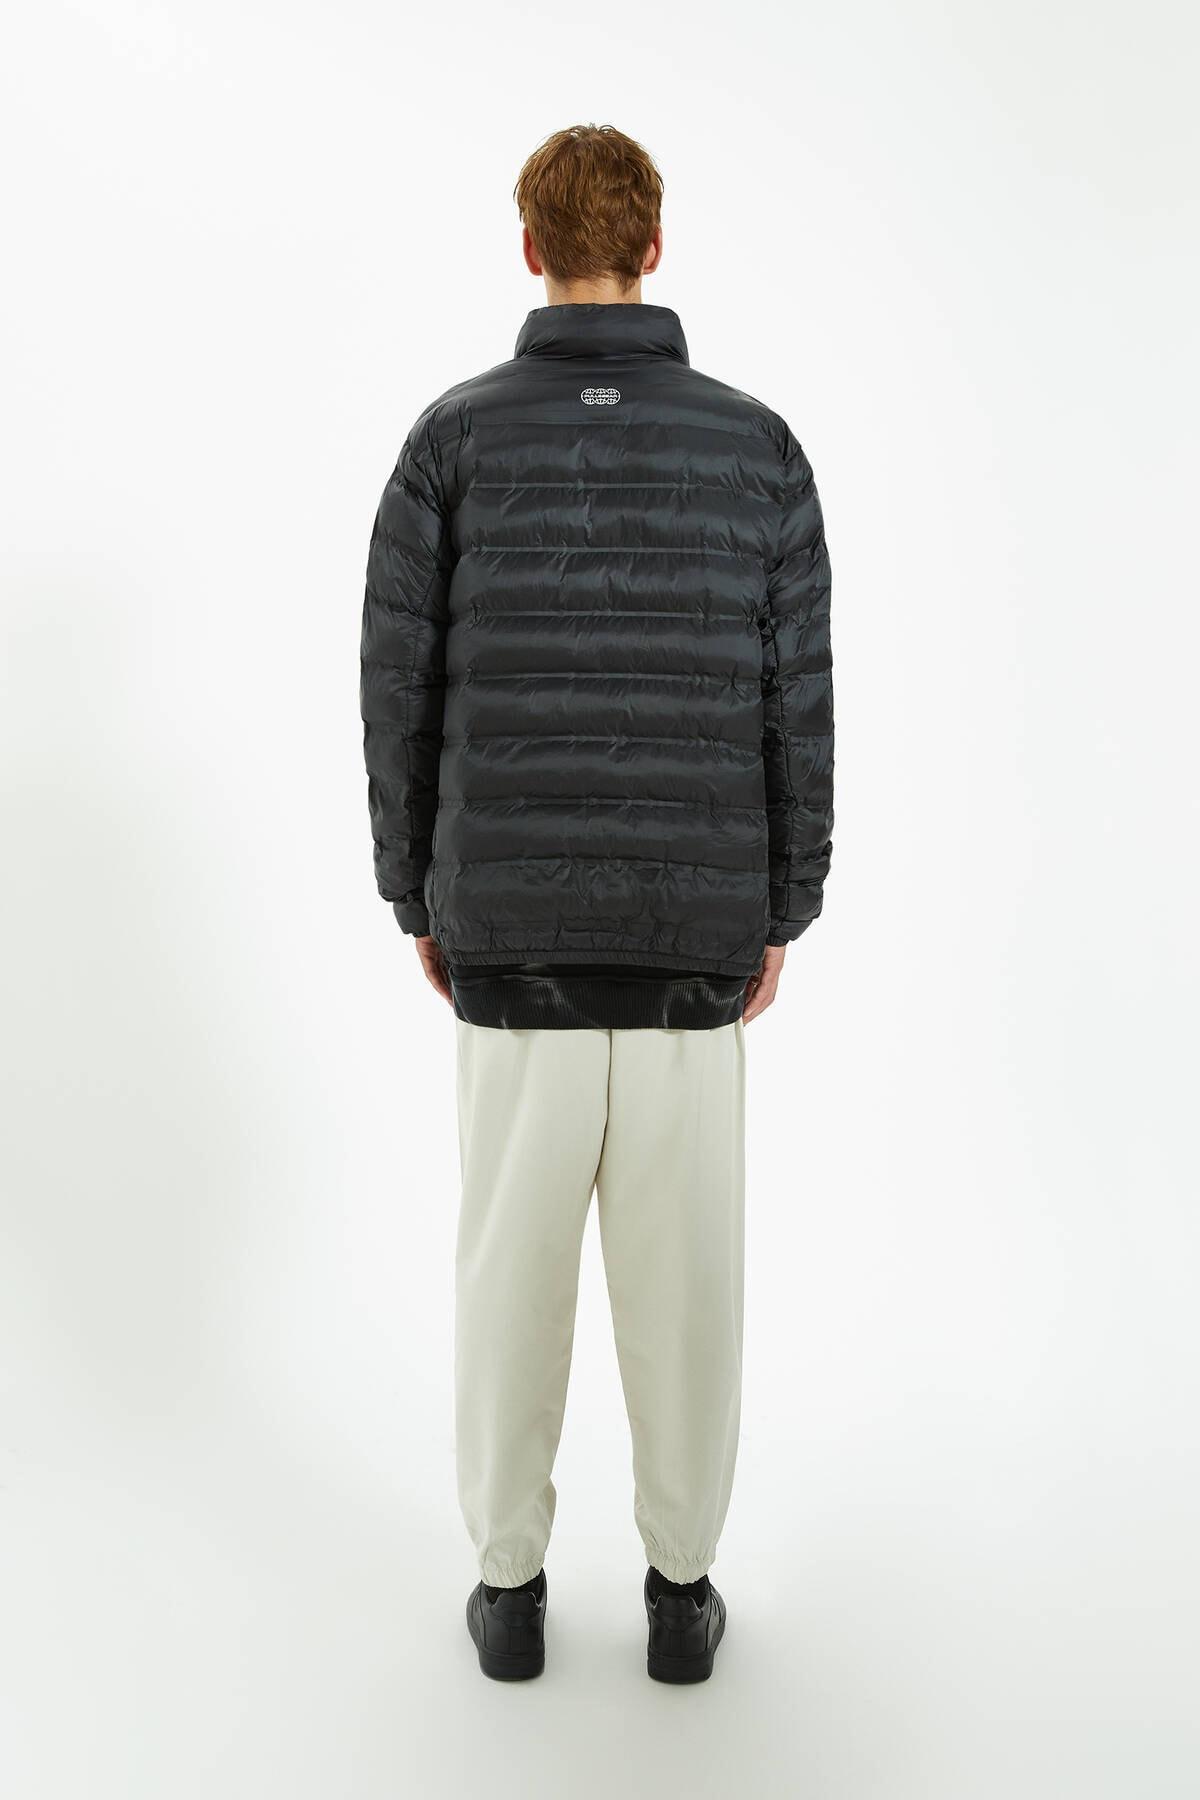 Pull & Bear Erkek Siyah Hafif Kumaş Şişme Mont 09710531 3